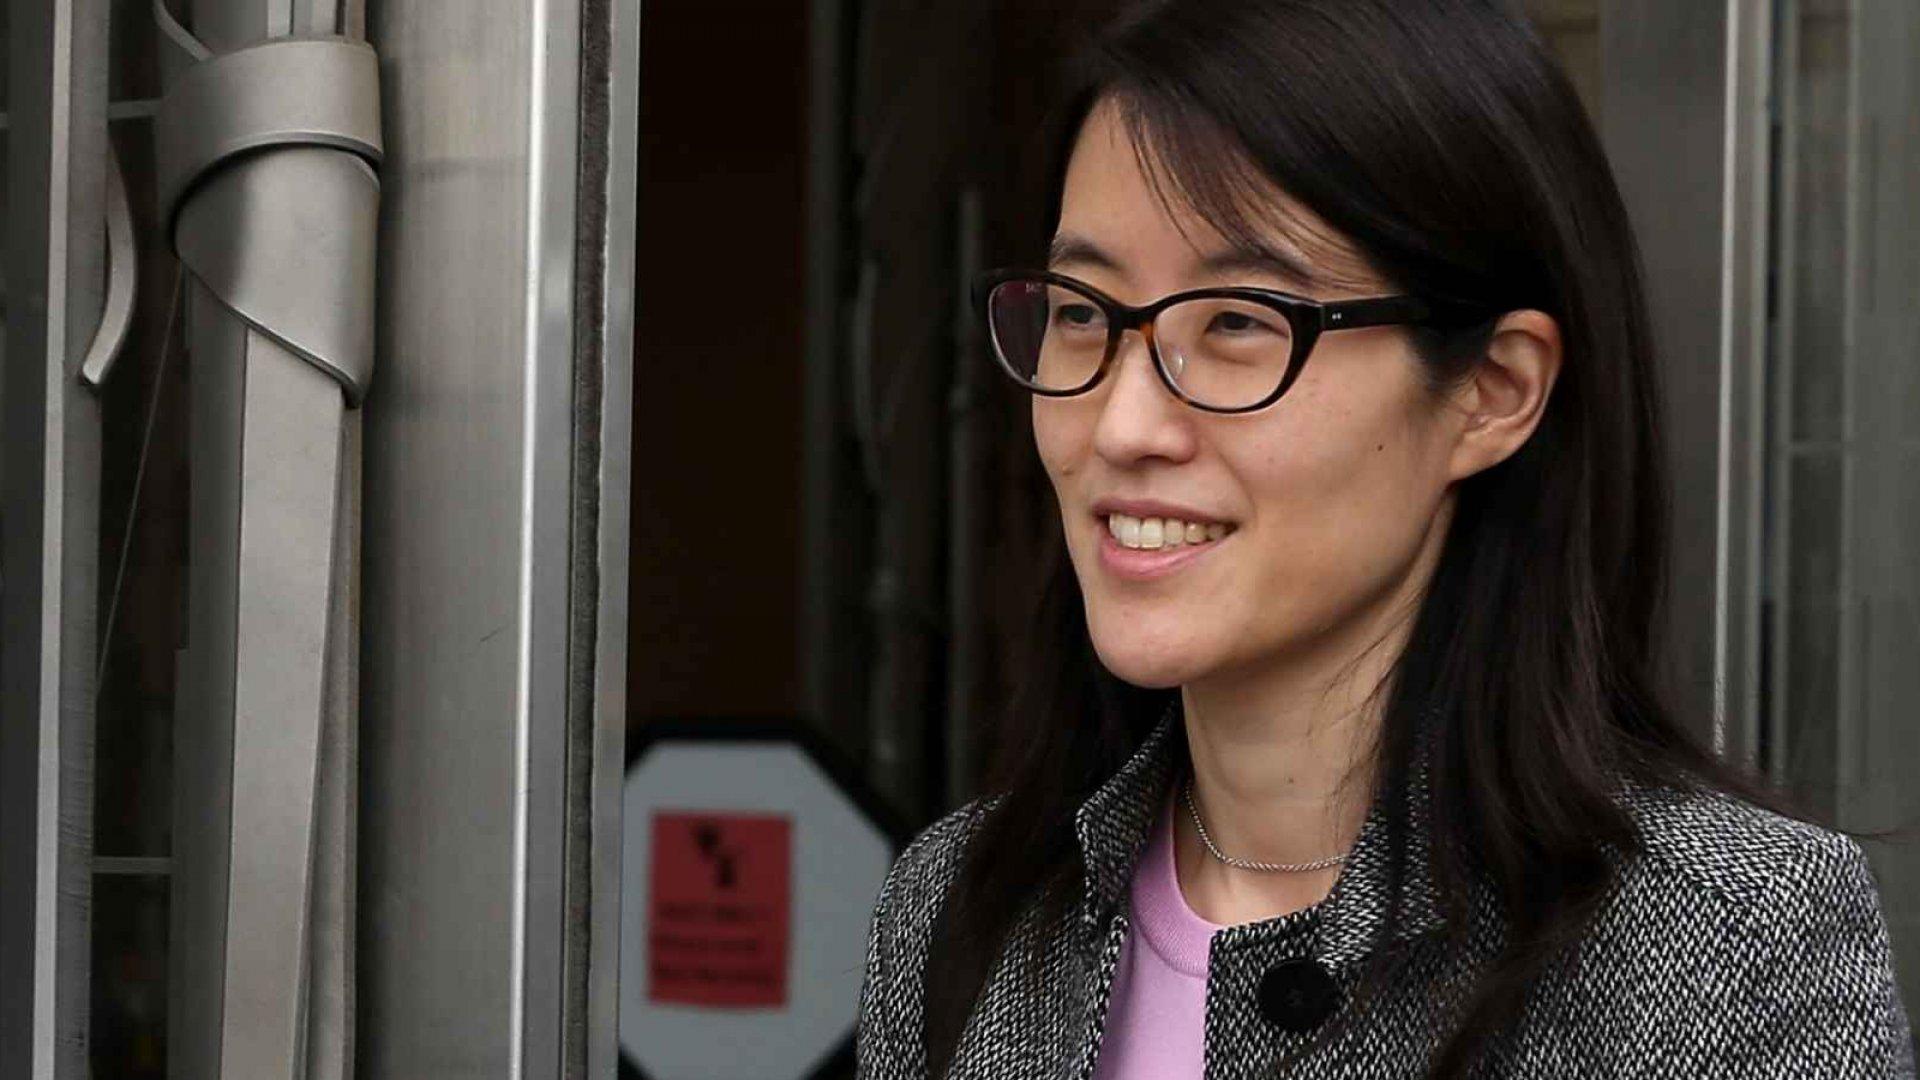 Reddit CEO Ellen Pao